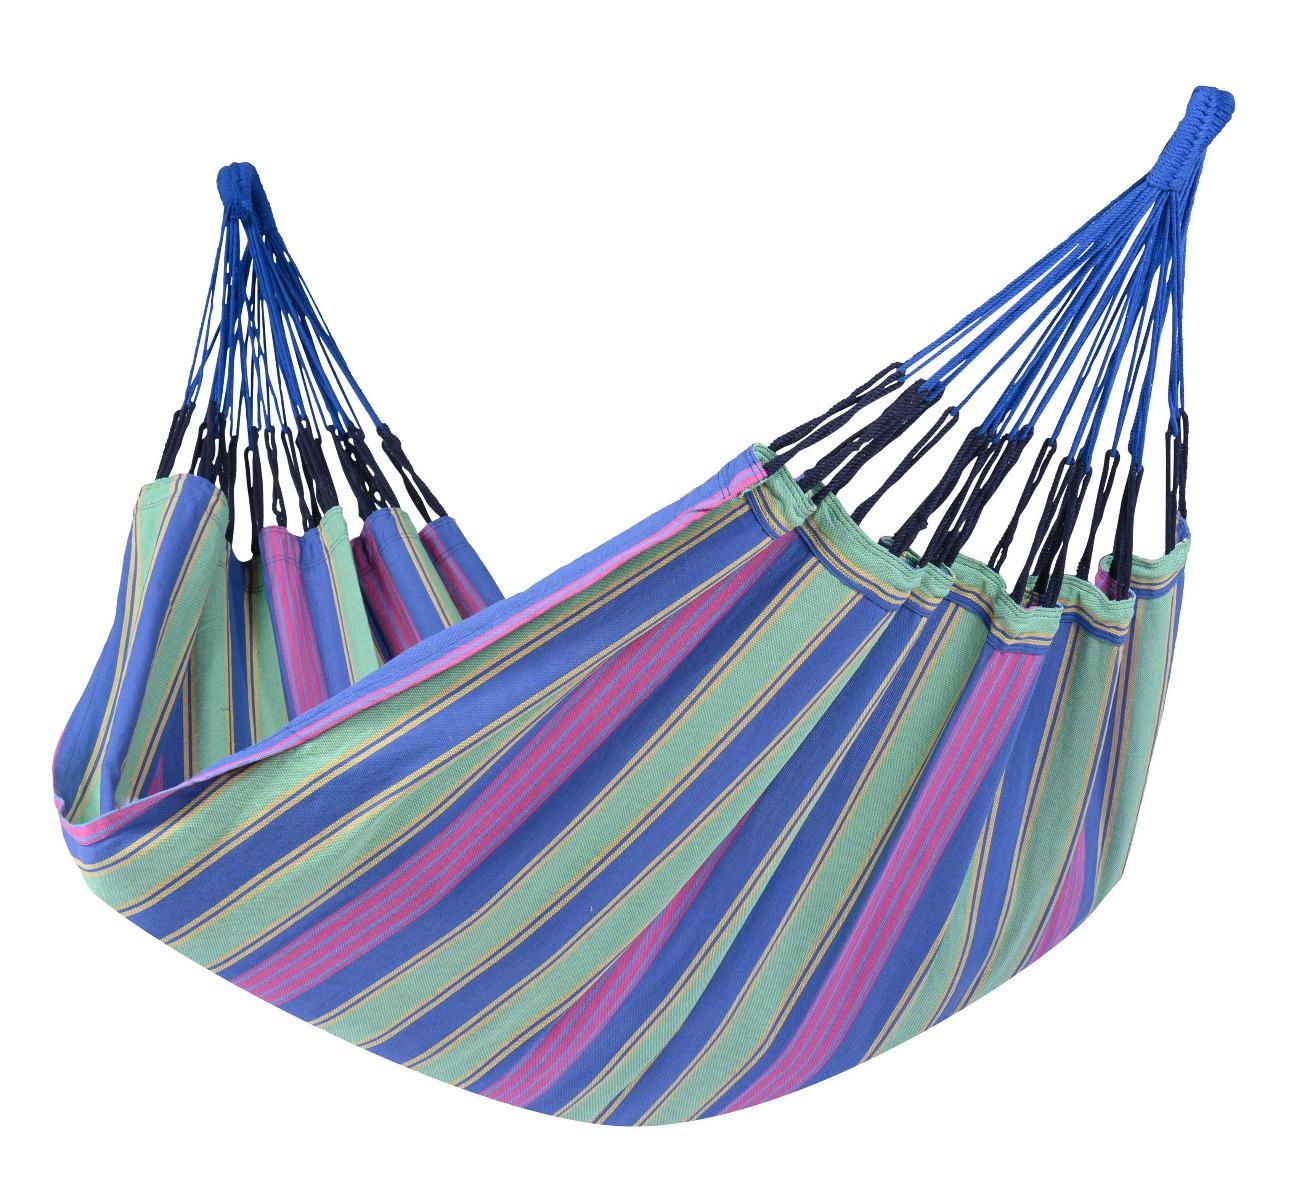 Hangmat 'Cuba' Blueberry - Tropilex �